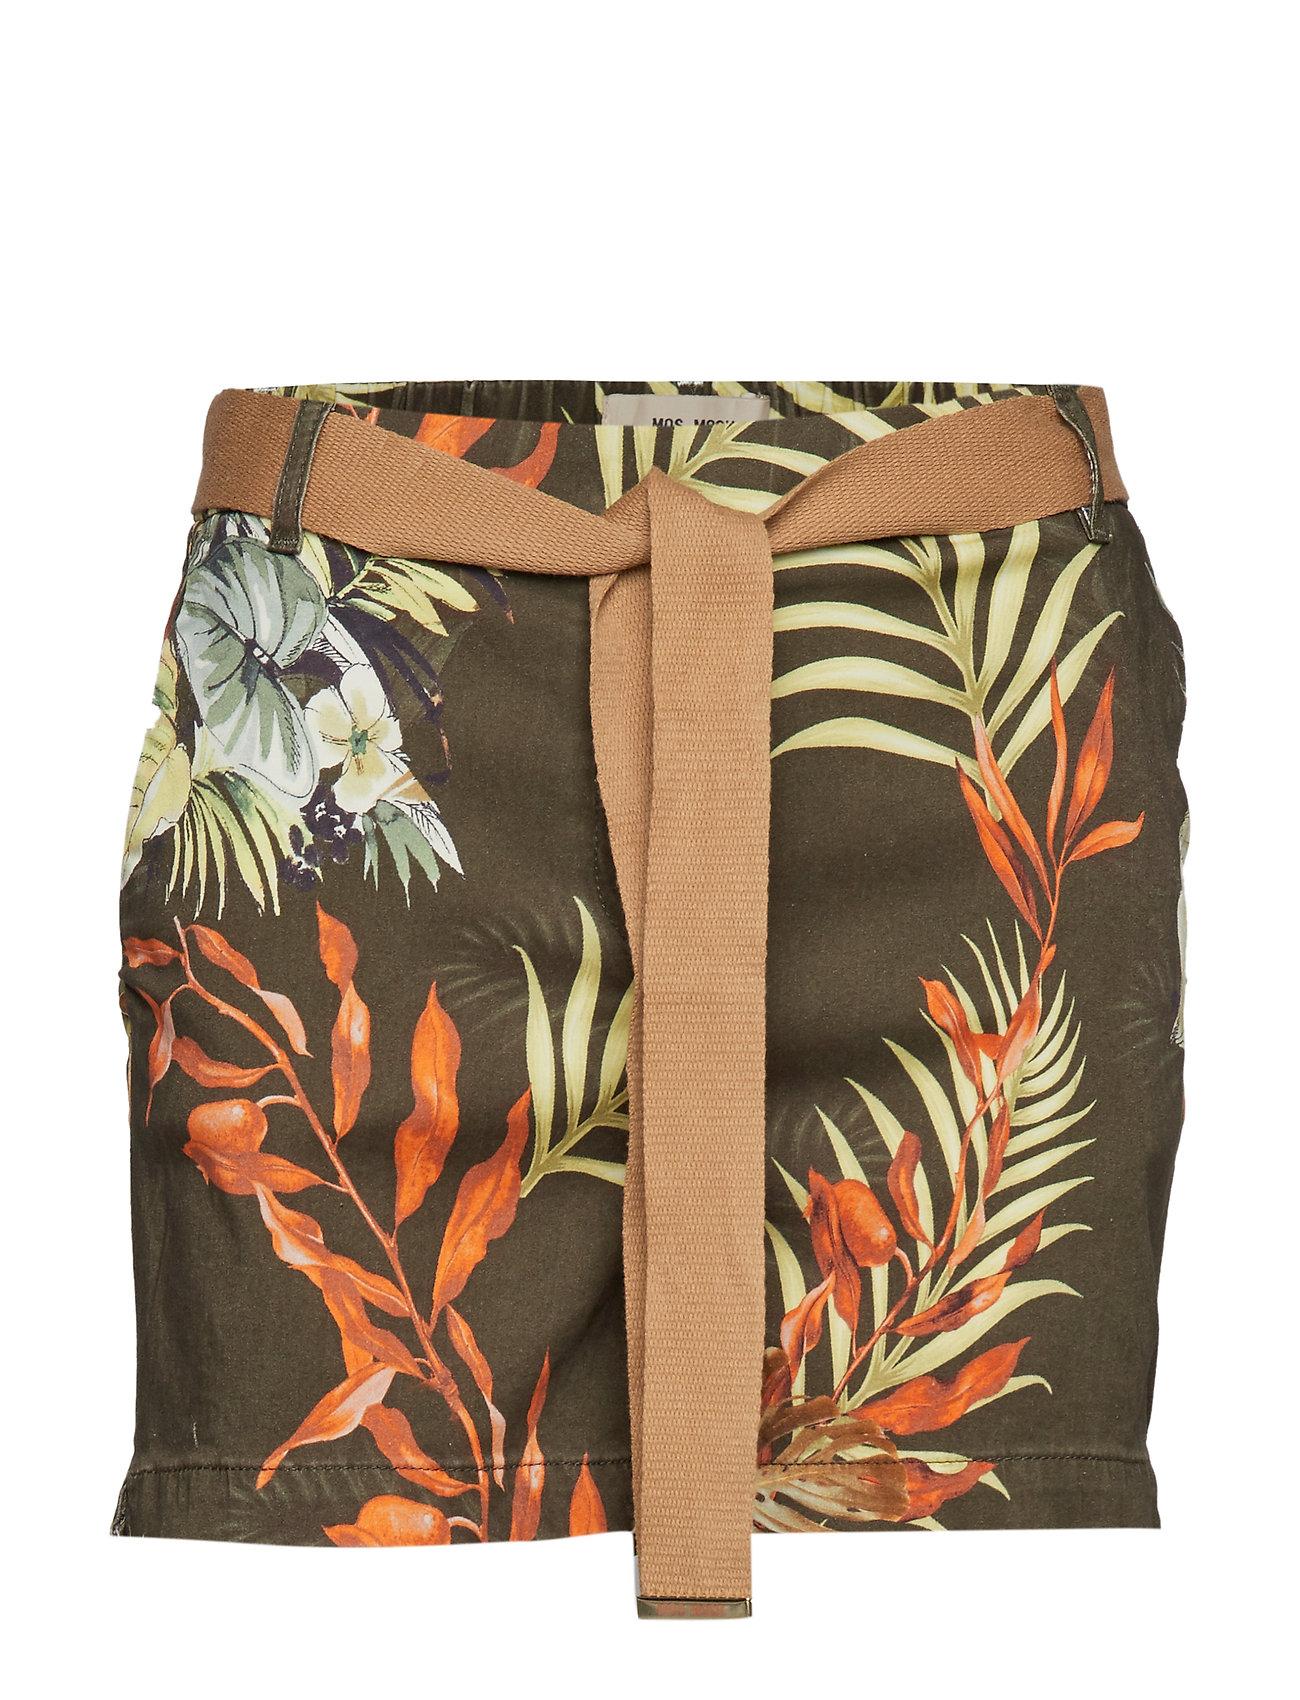 MOS MOSH Penton Printed Shorts